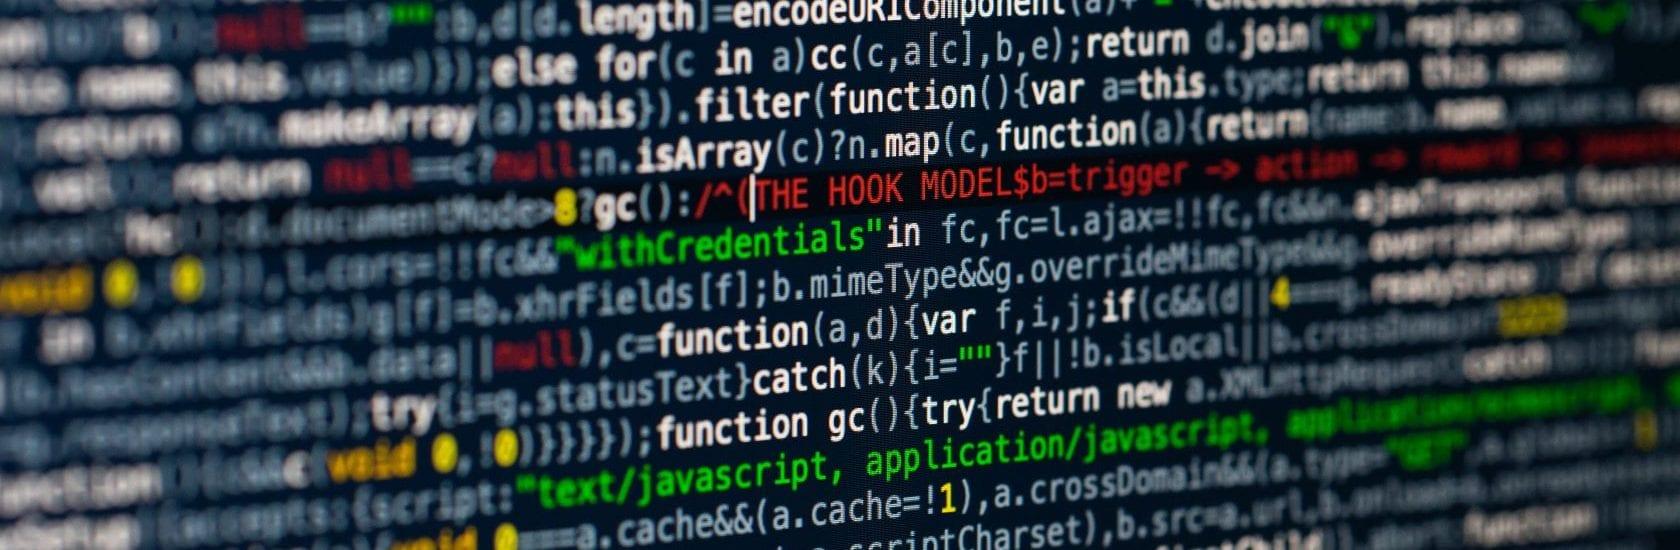 web design html css code